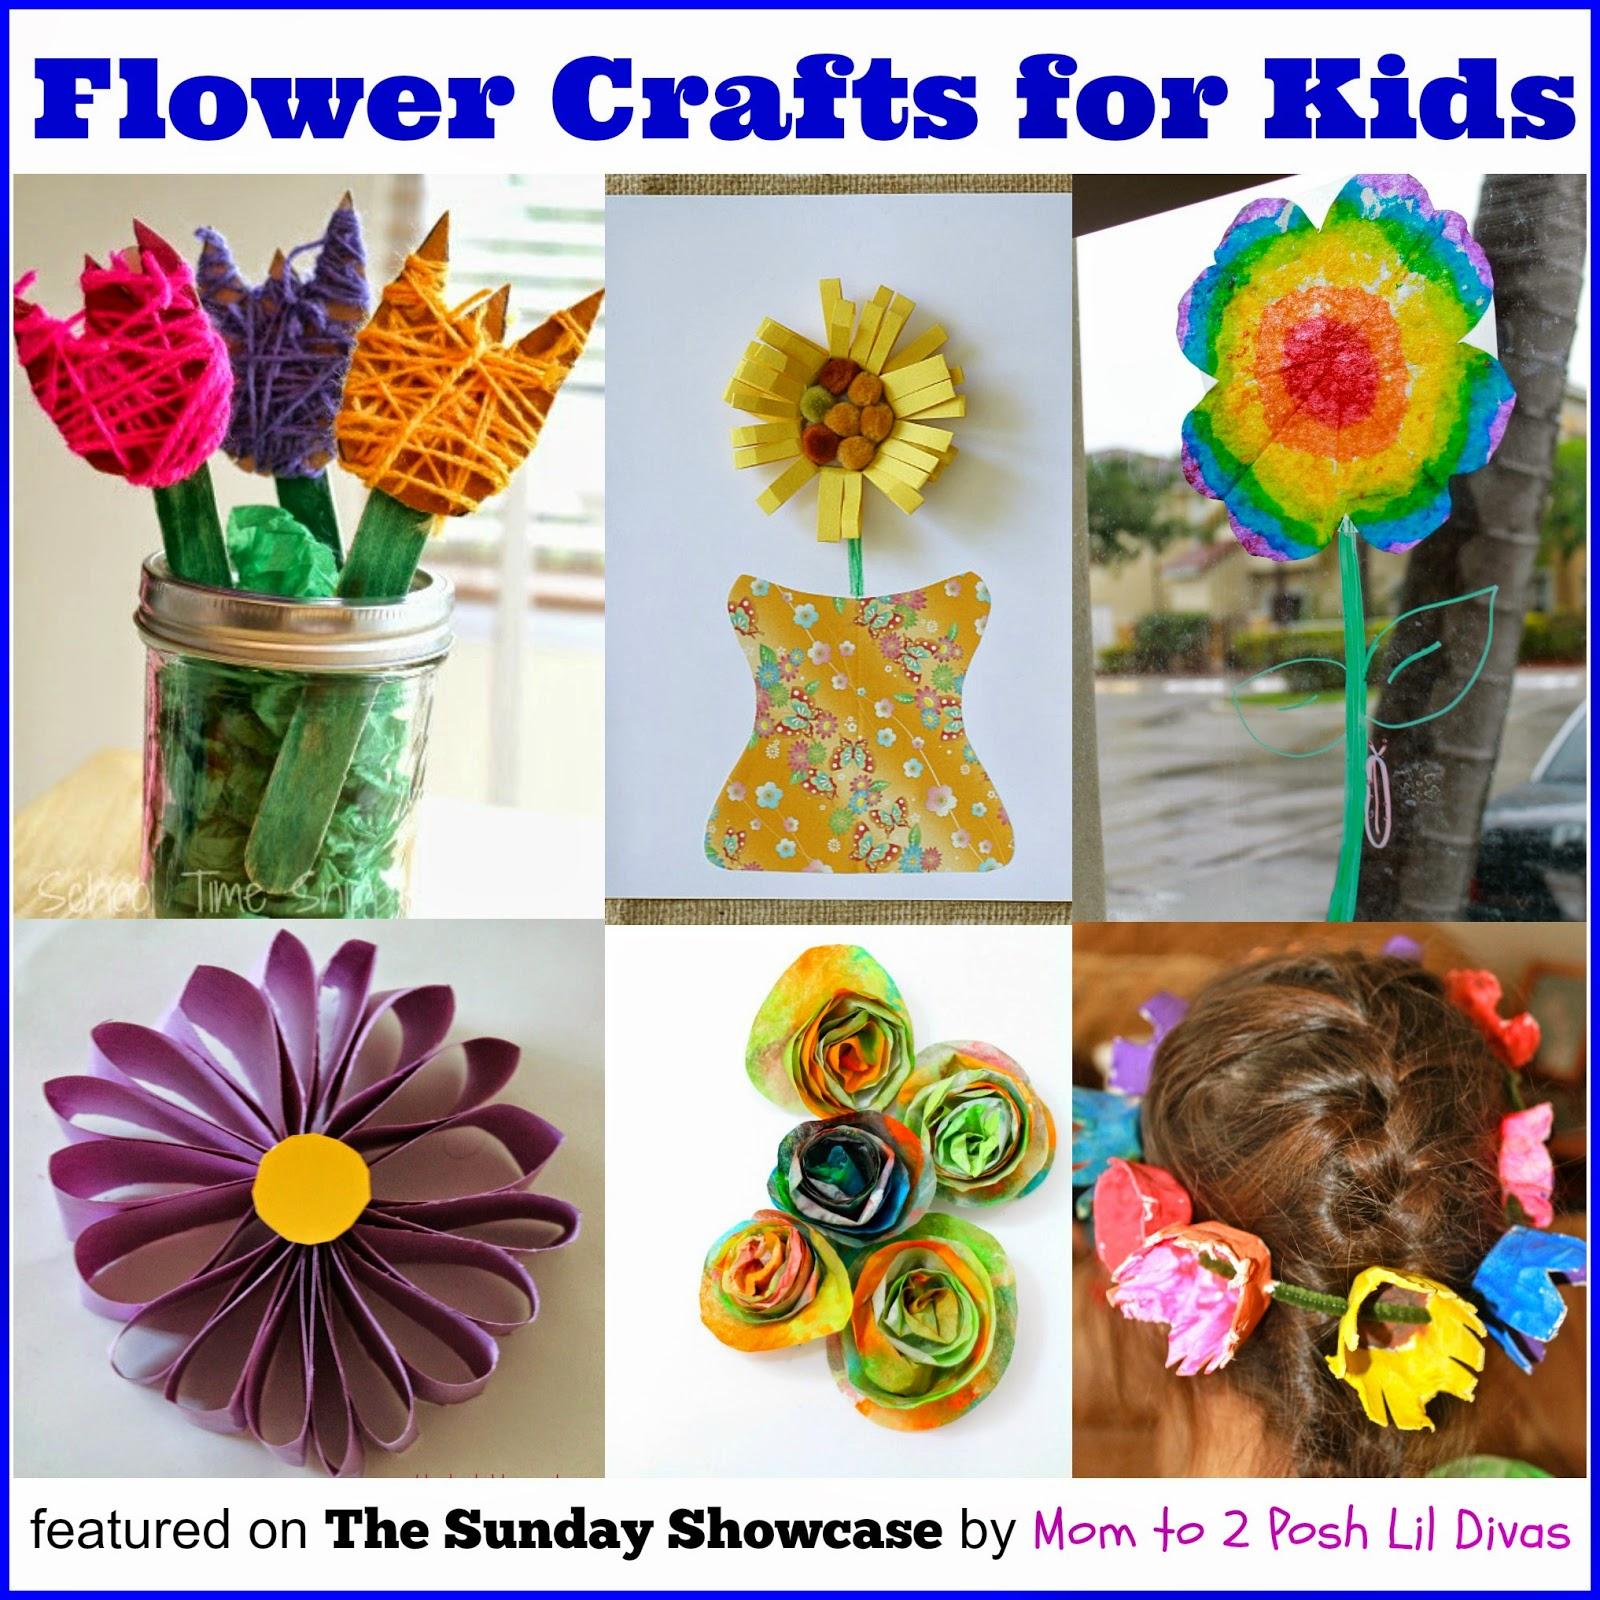 Mom To 2 Posh Lil Divas Flower Crafts For Kids The Sunday Showcase